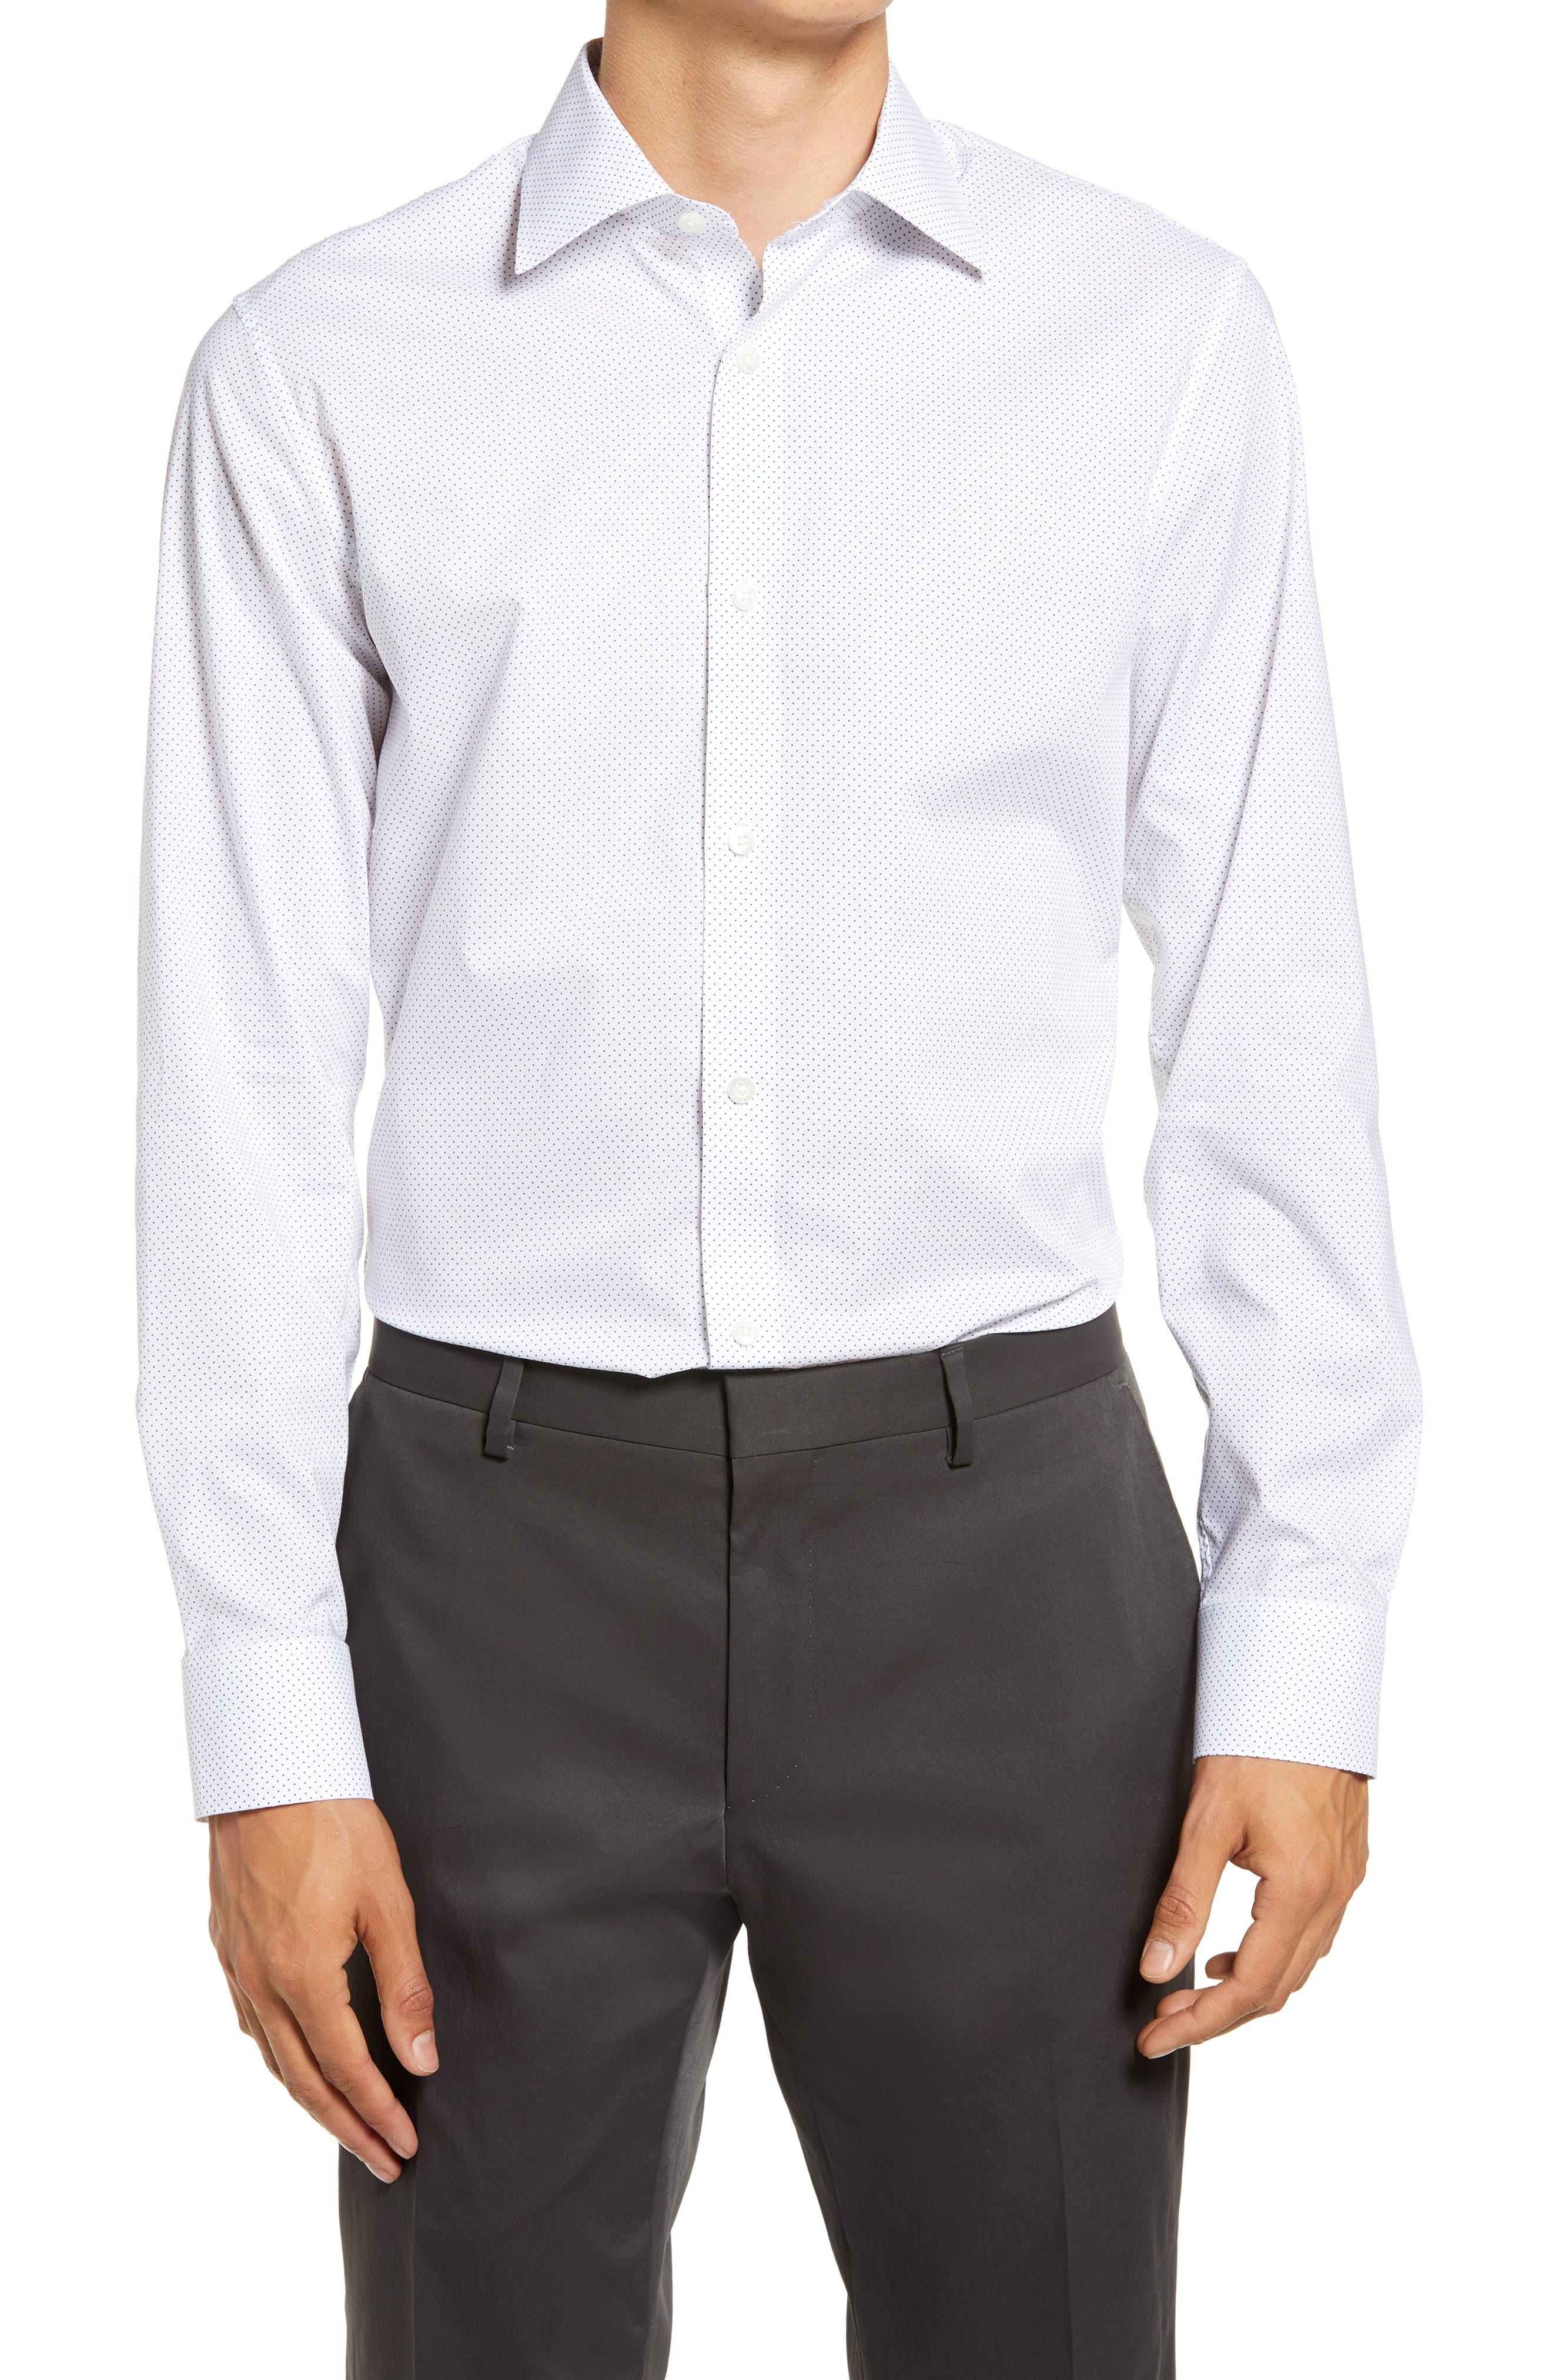 Jetsetter Slim Fit Dot Stretch Dress Shirt